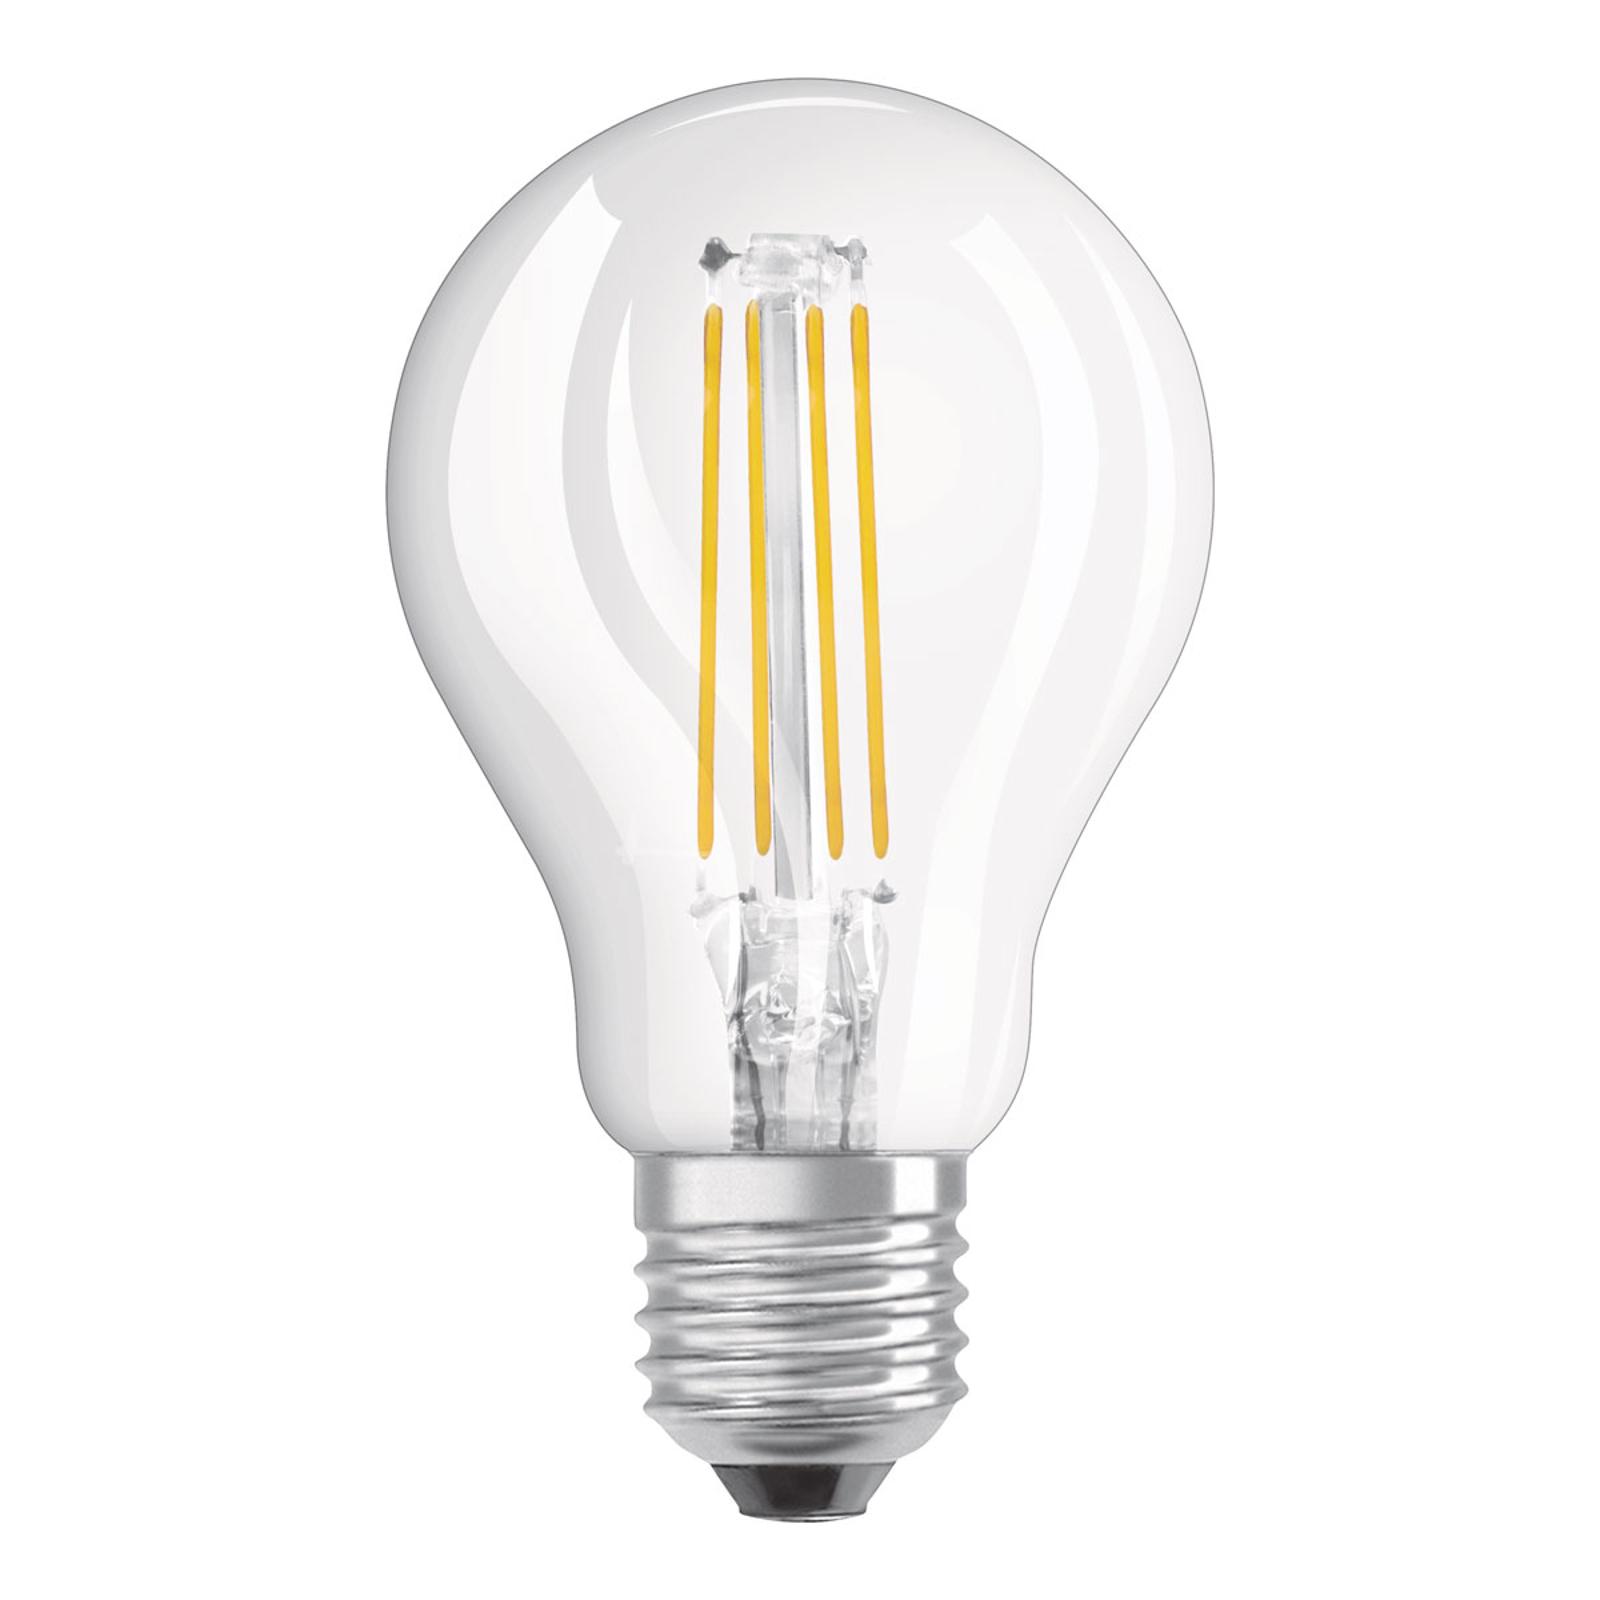 OSRAM-LED-lamppu E27 4W Classic P 4 000 K kirkas